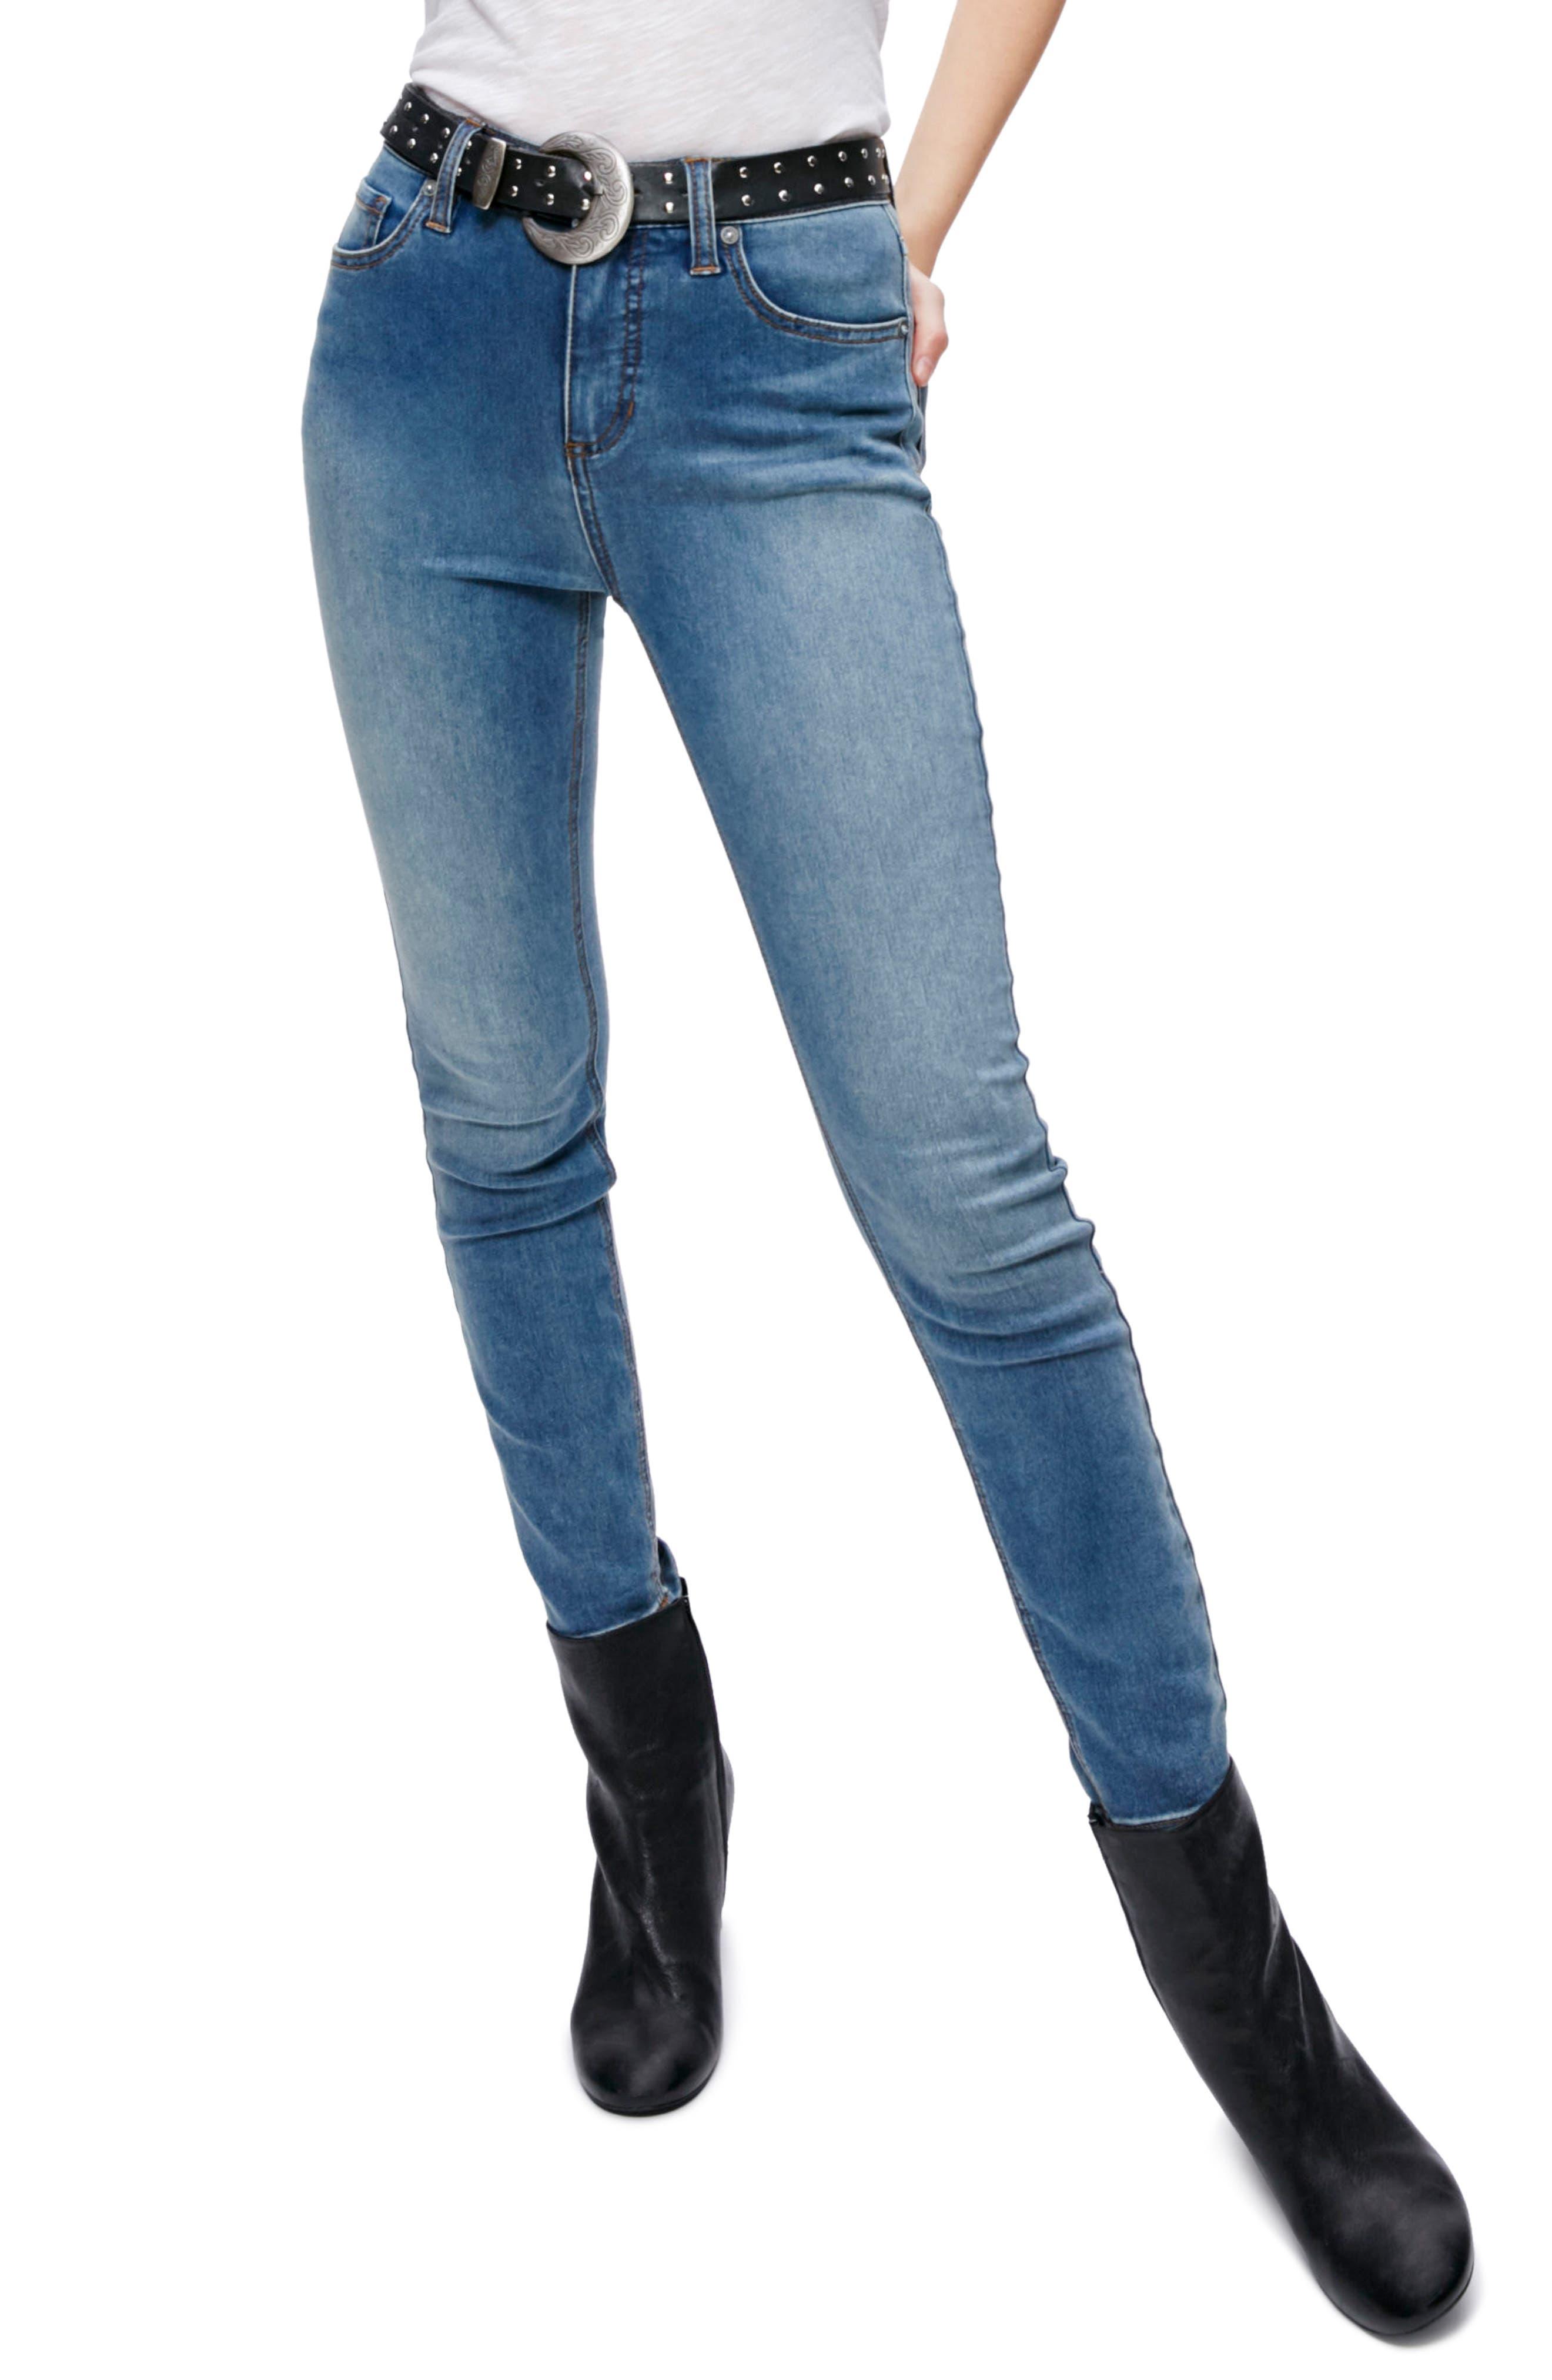 Main Image - Free People Gummy High Waist Jeans